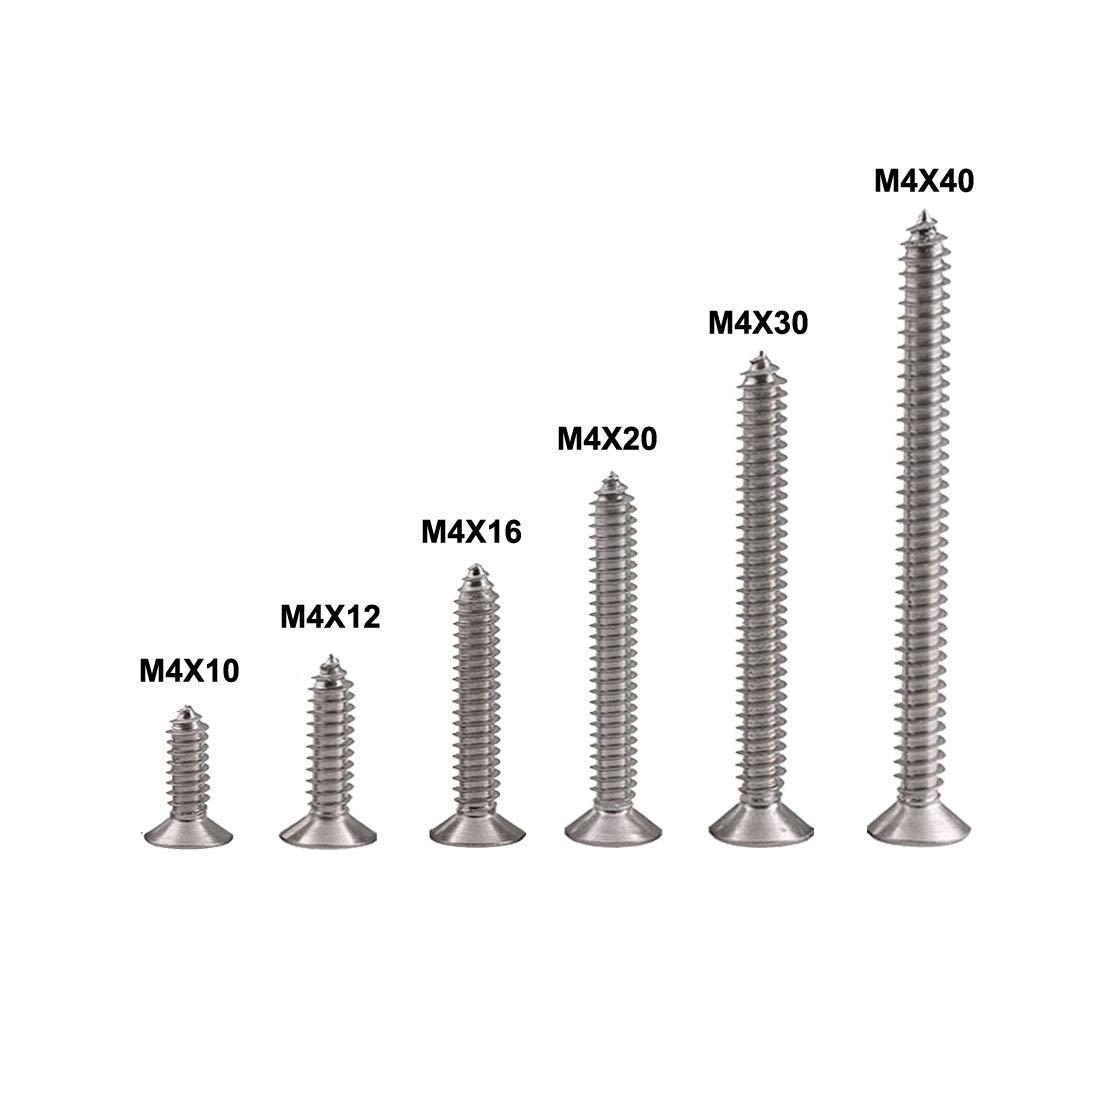 Tornillos autorroscantes Phillips de acero inoxidable para bricolaje Qrity M4